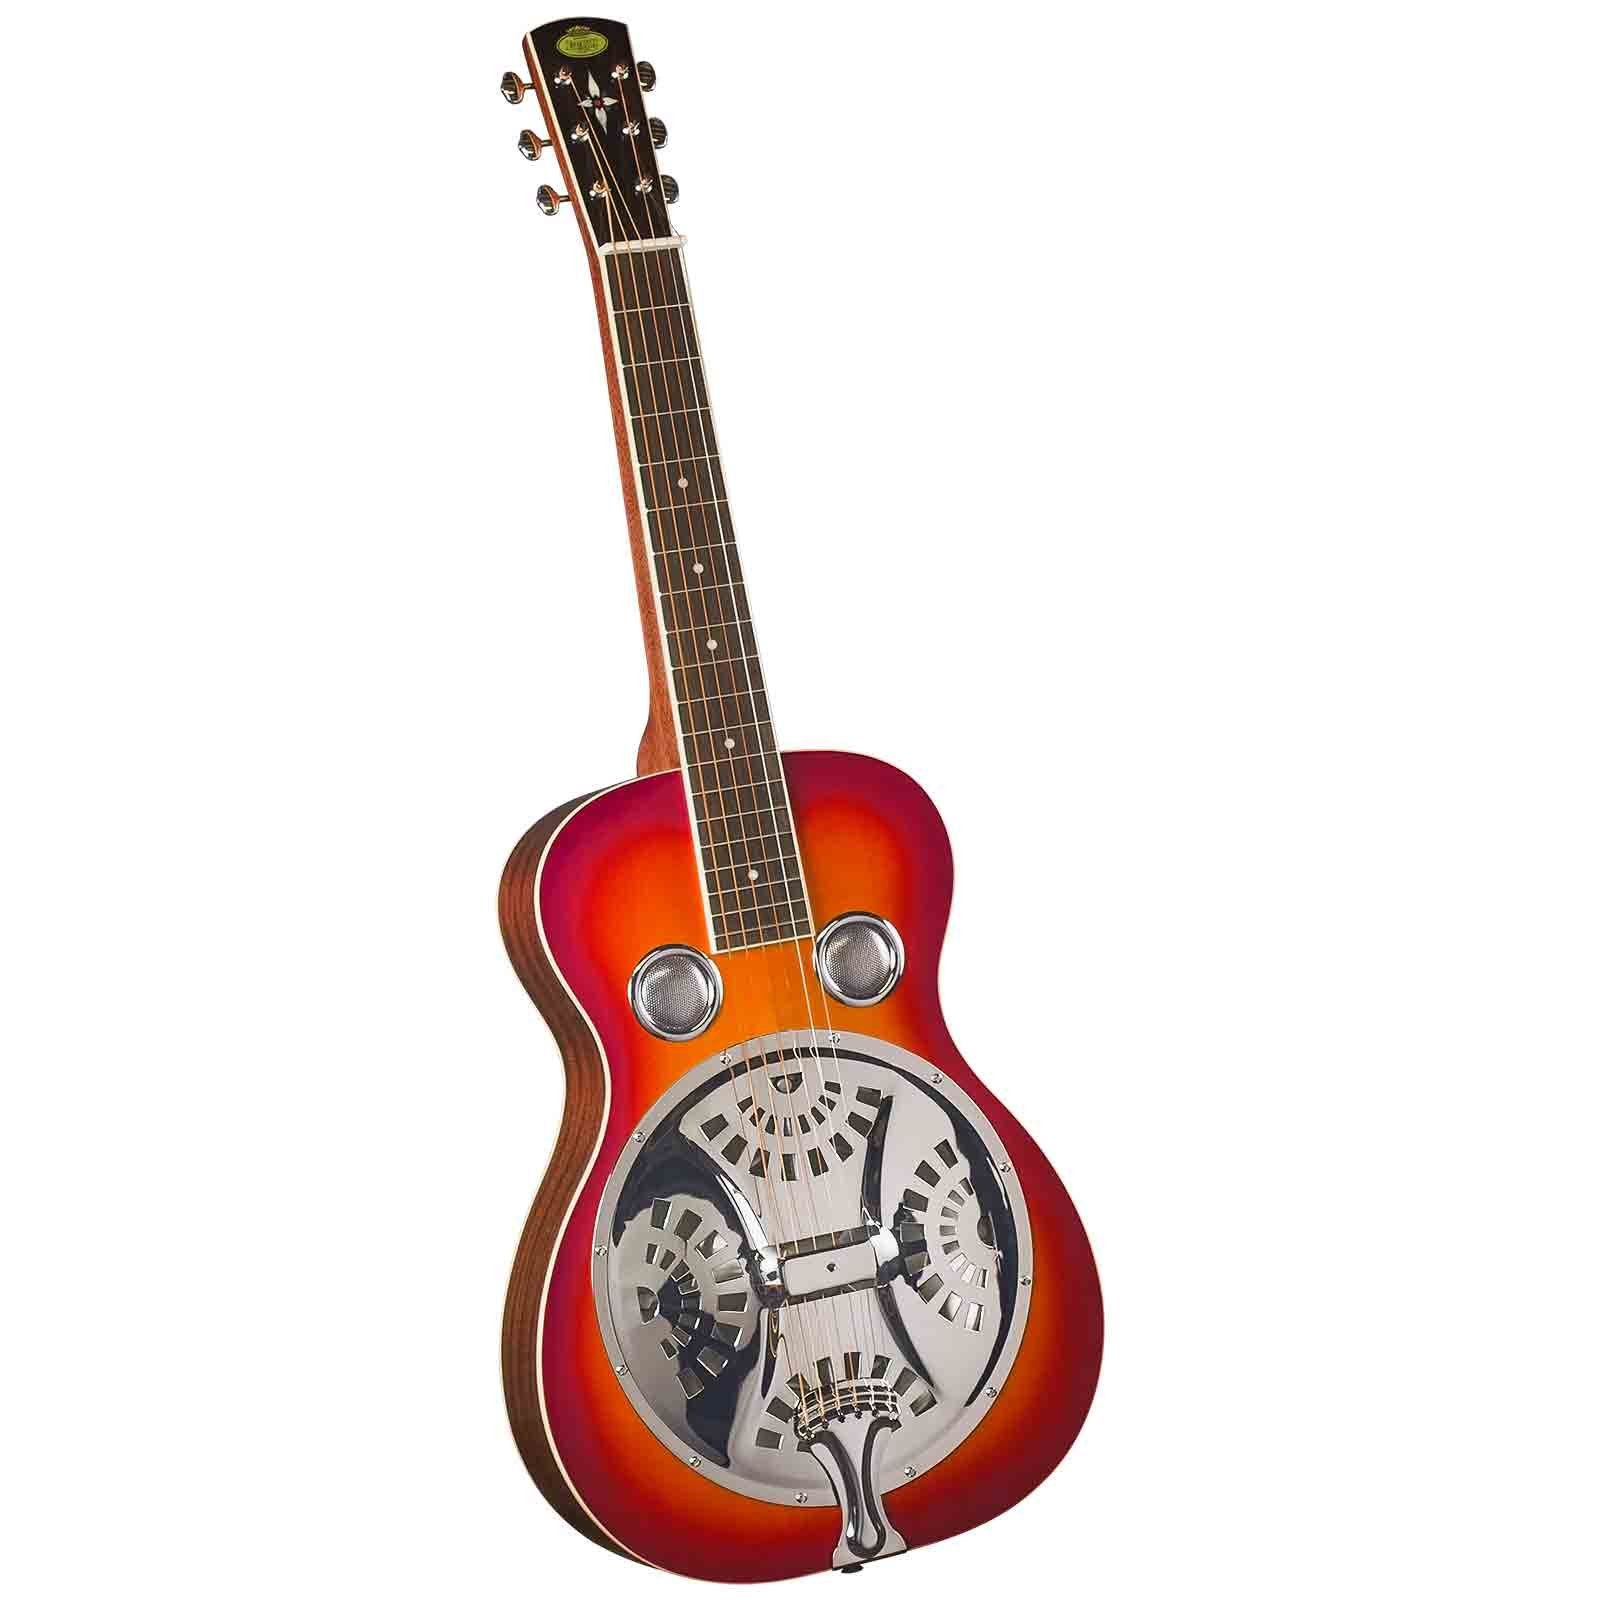 Regal RD-40CHS Studio Series Squareneck Resophonic Guitar - Cherry Sunburst by Regal Resophonic Guitars